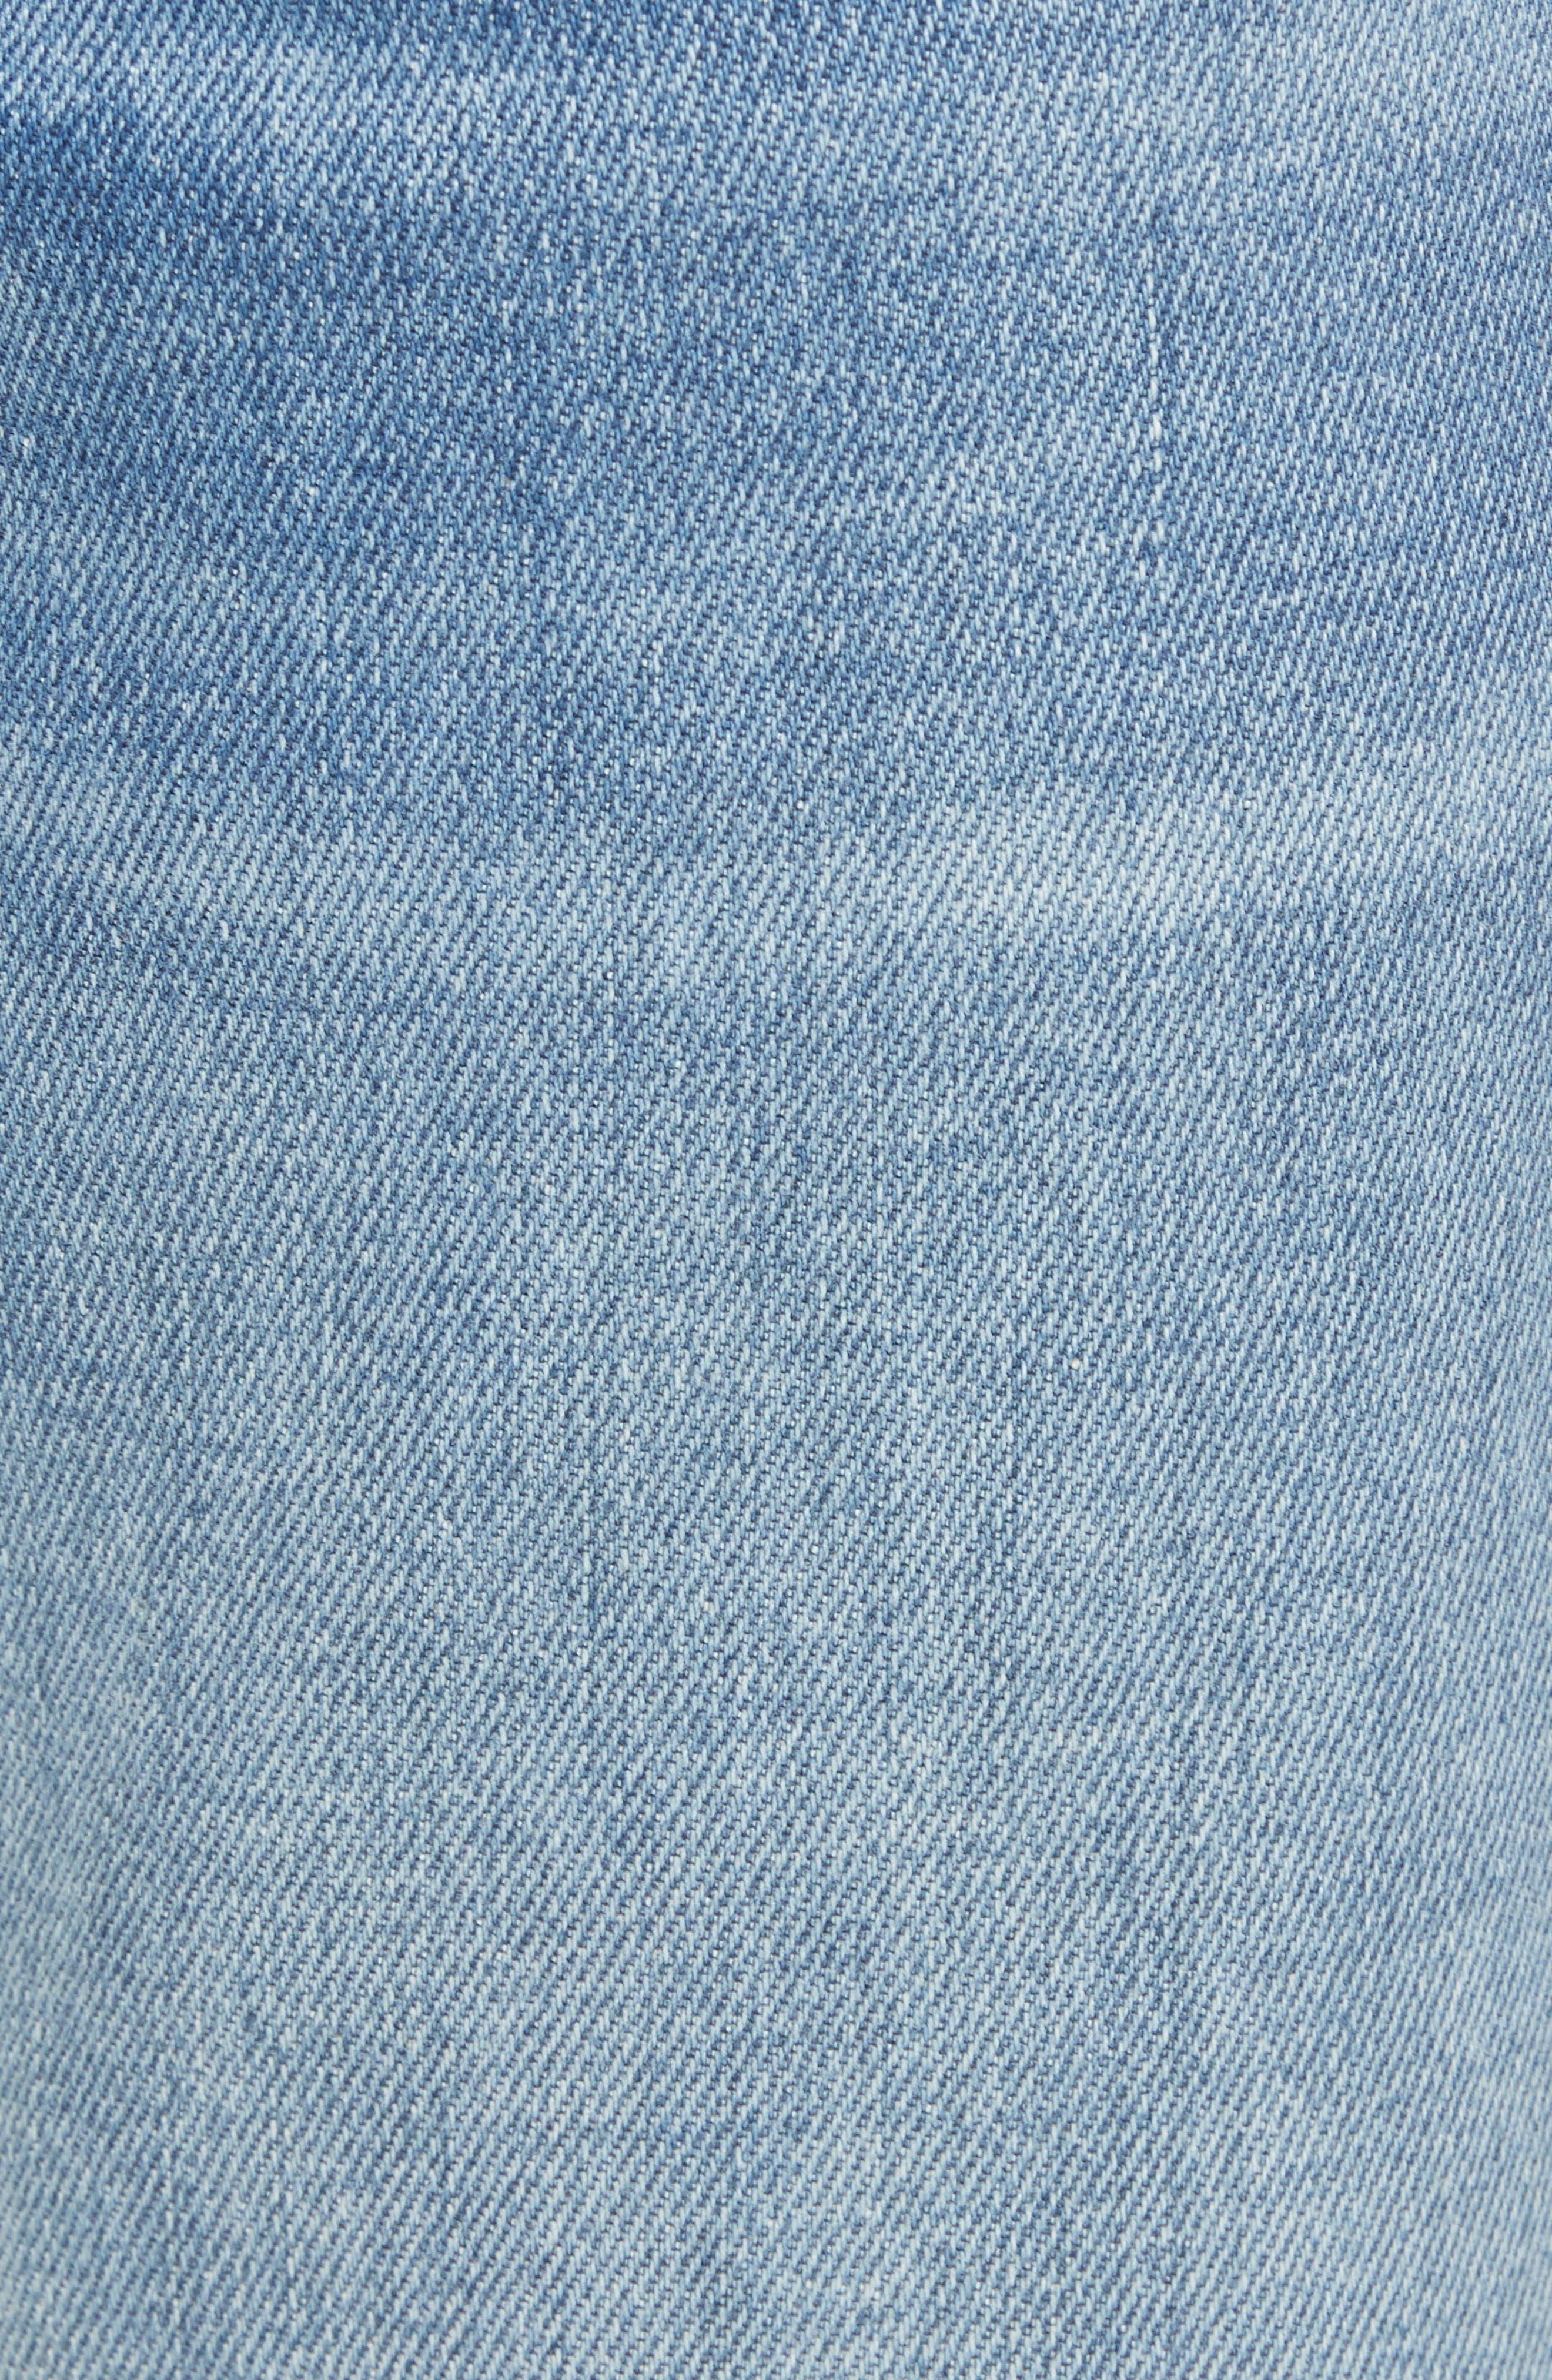 L'Homme Skinny Jeans,                             Alternate thumbnail 5, color,                             PICKNEY